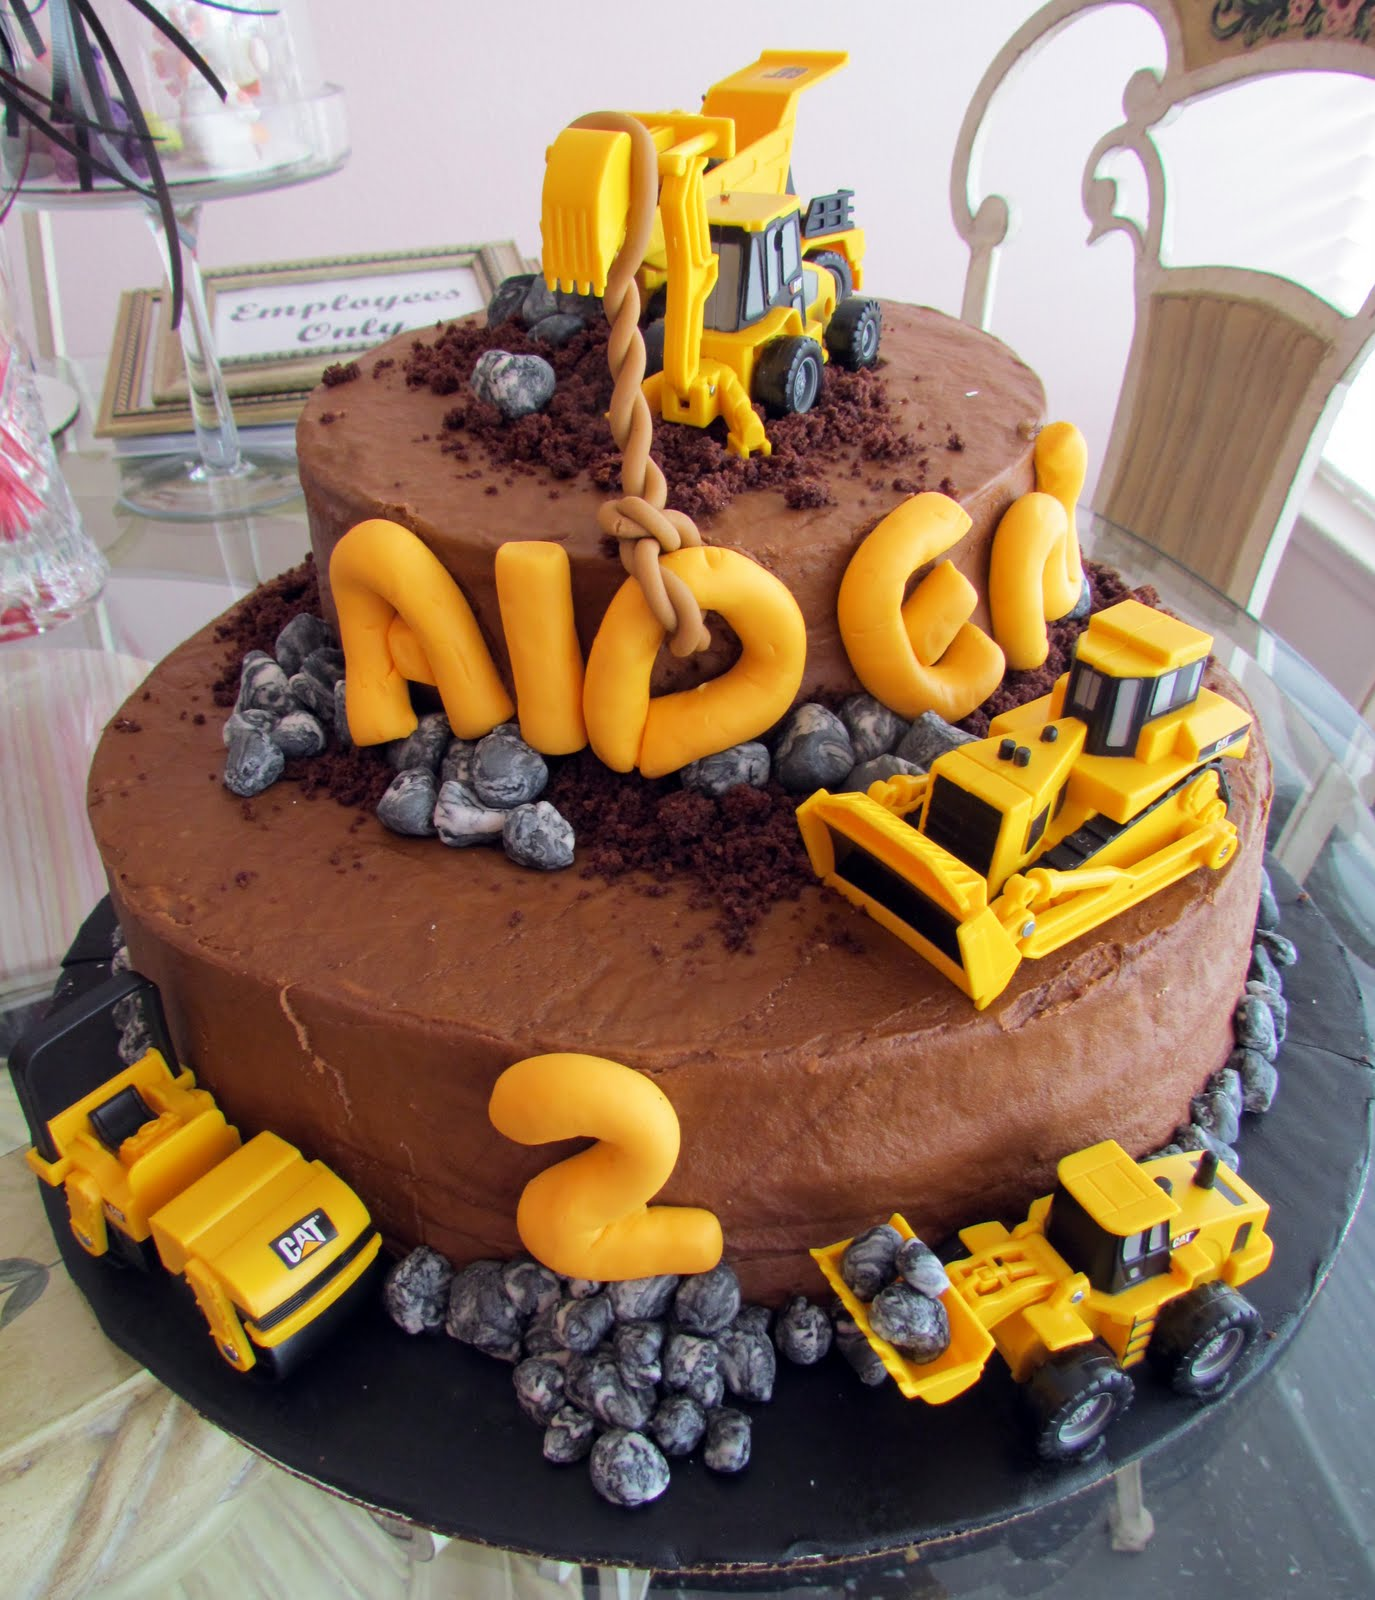 Rozannes Cakes: Crazy cakes